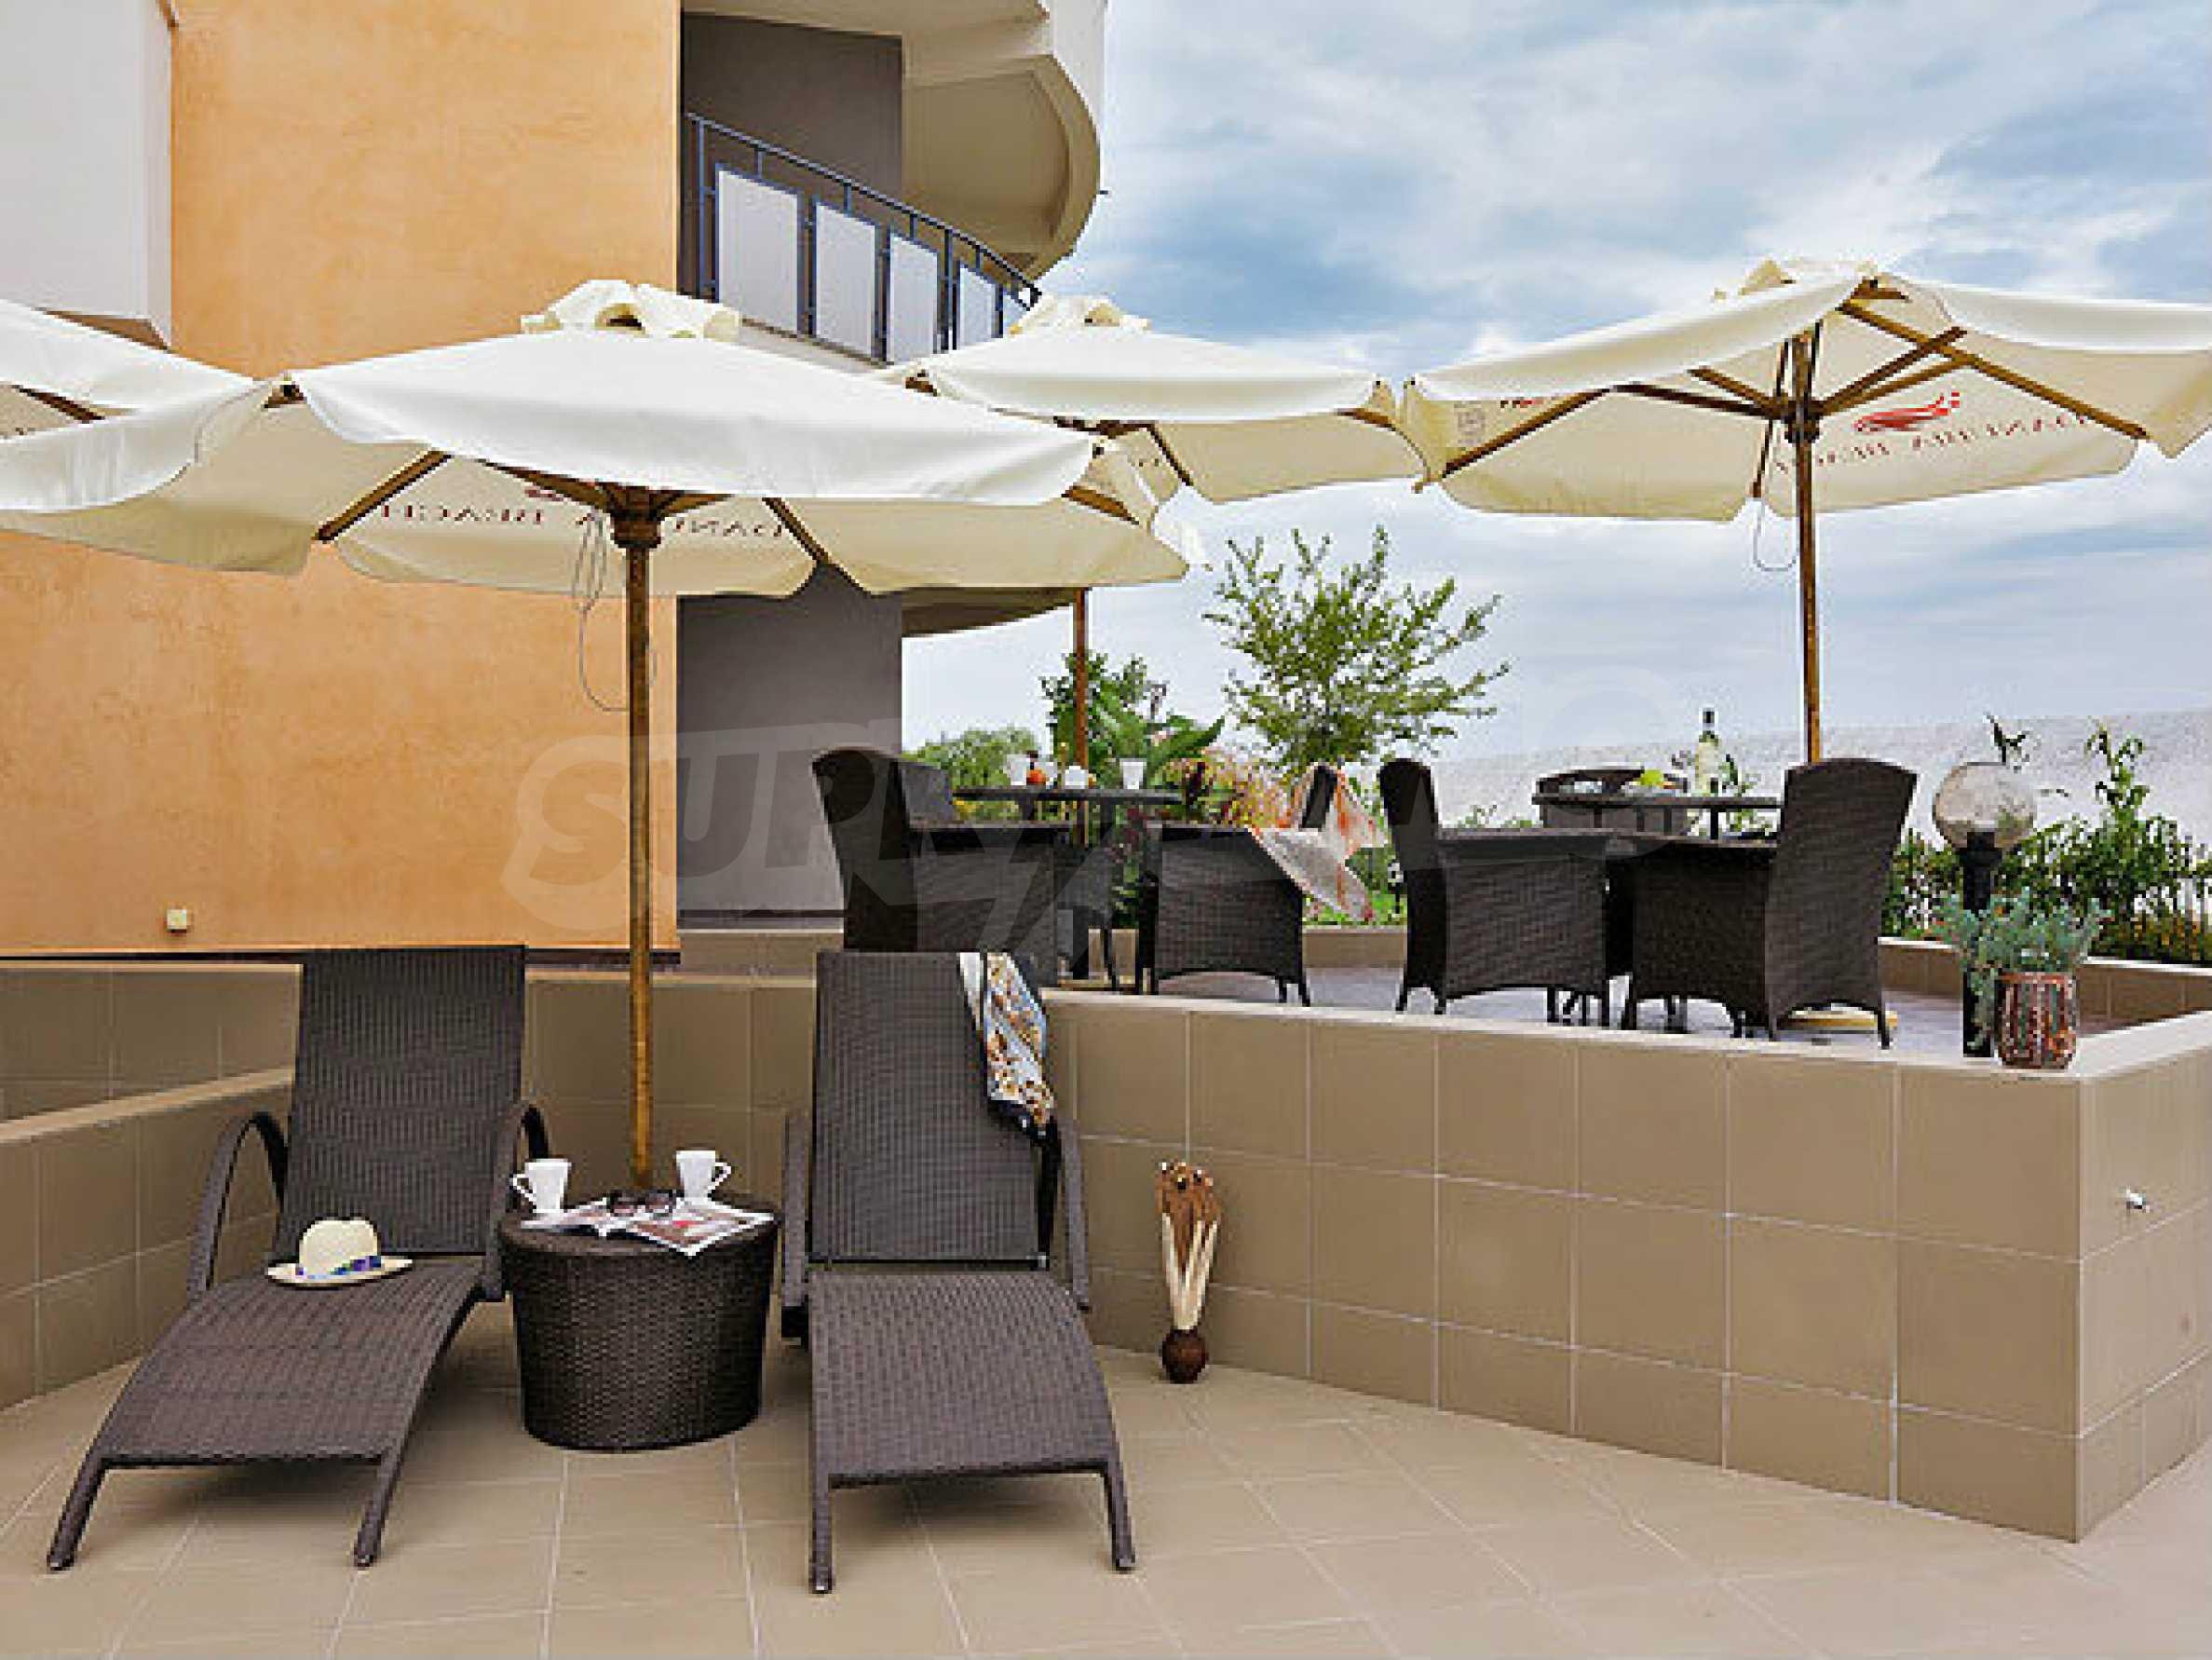 Coffee-bar with kitchen in Danubia Beach near Vidin and the Danube 11